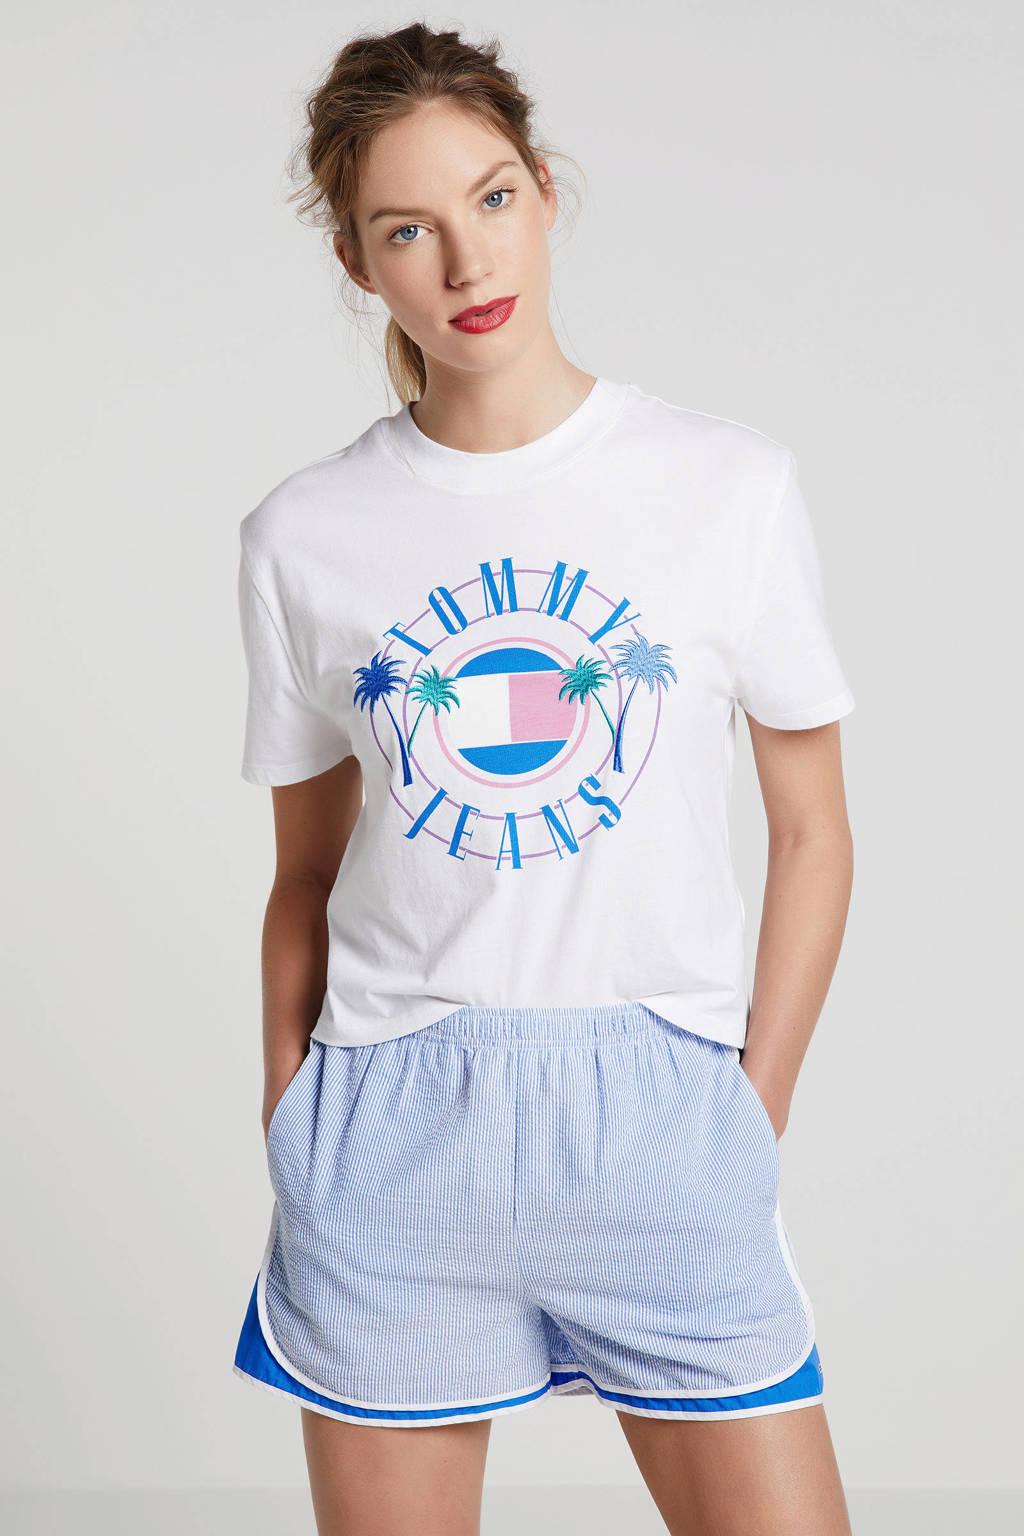 Tommy Jeans T-shirt met printopdruk wit/blauw, Wit/blauw